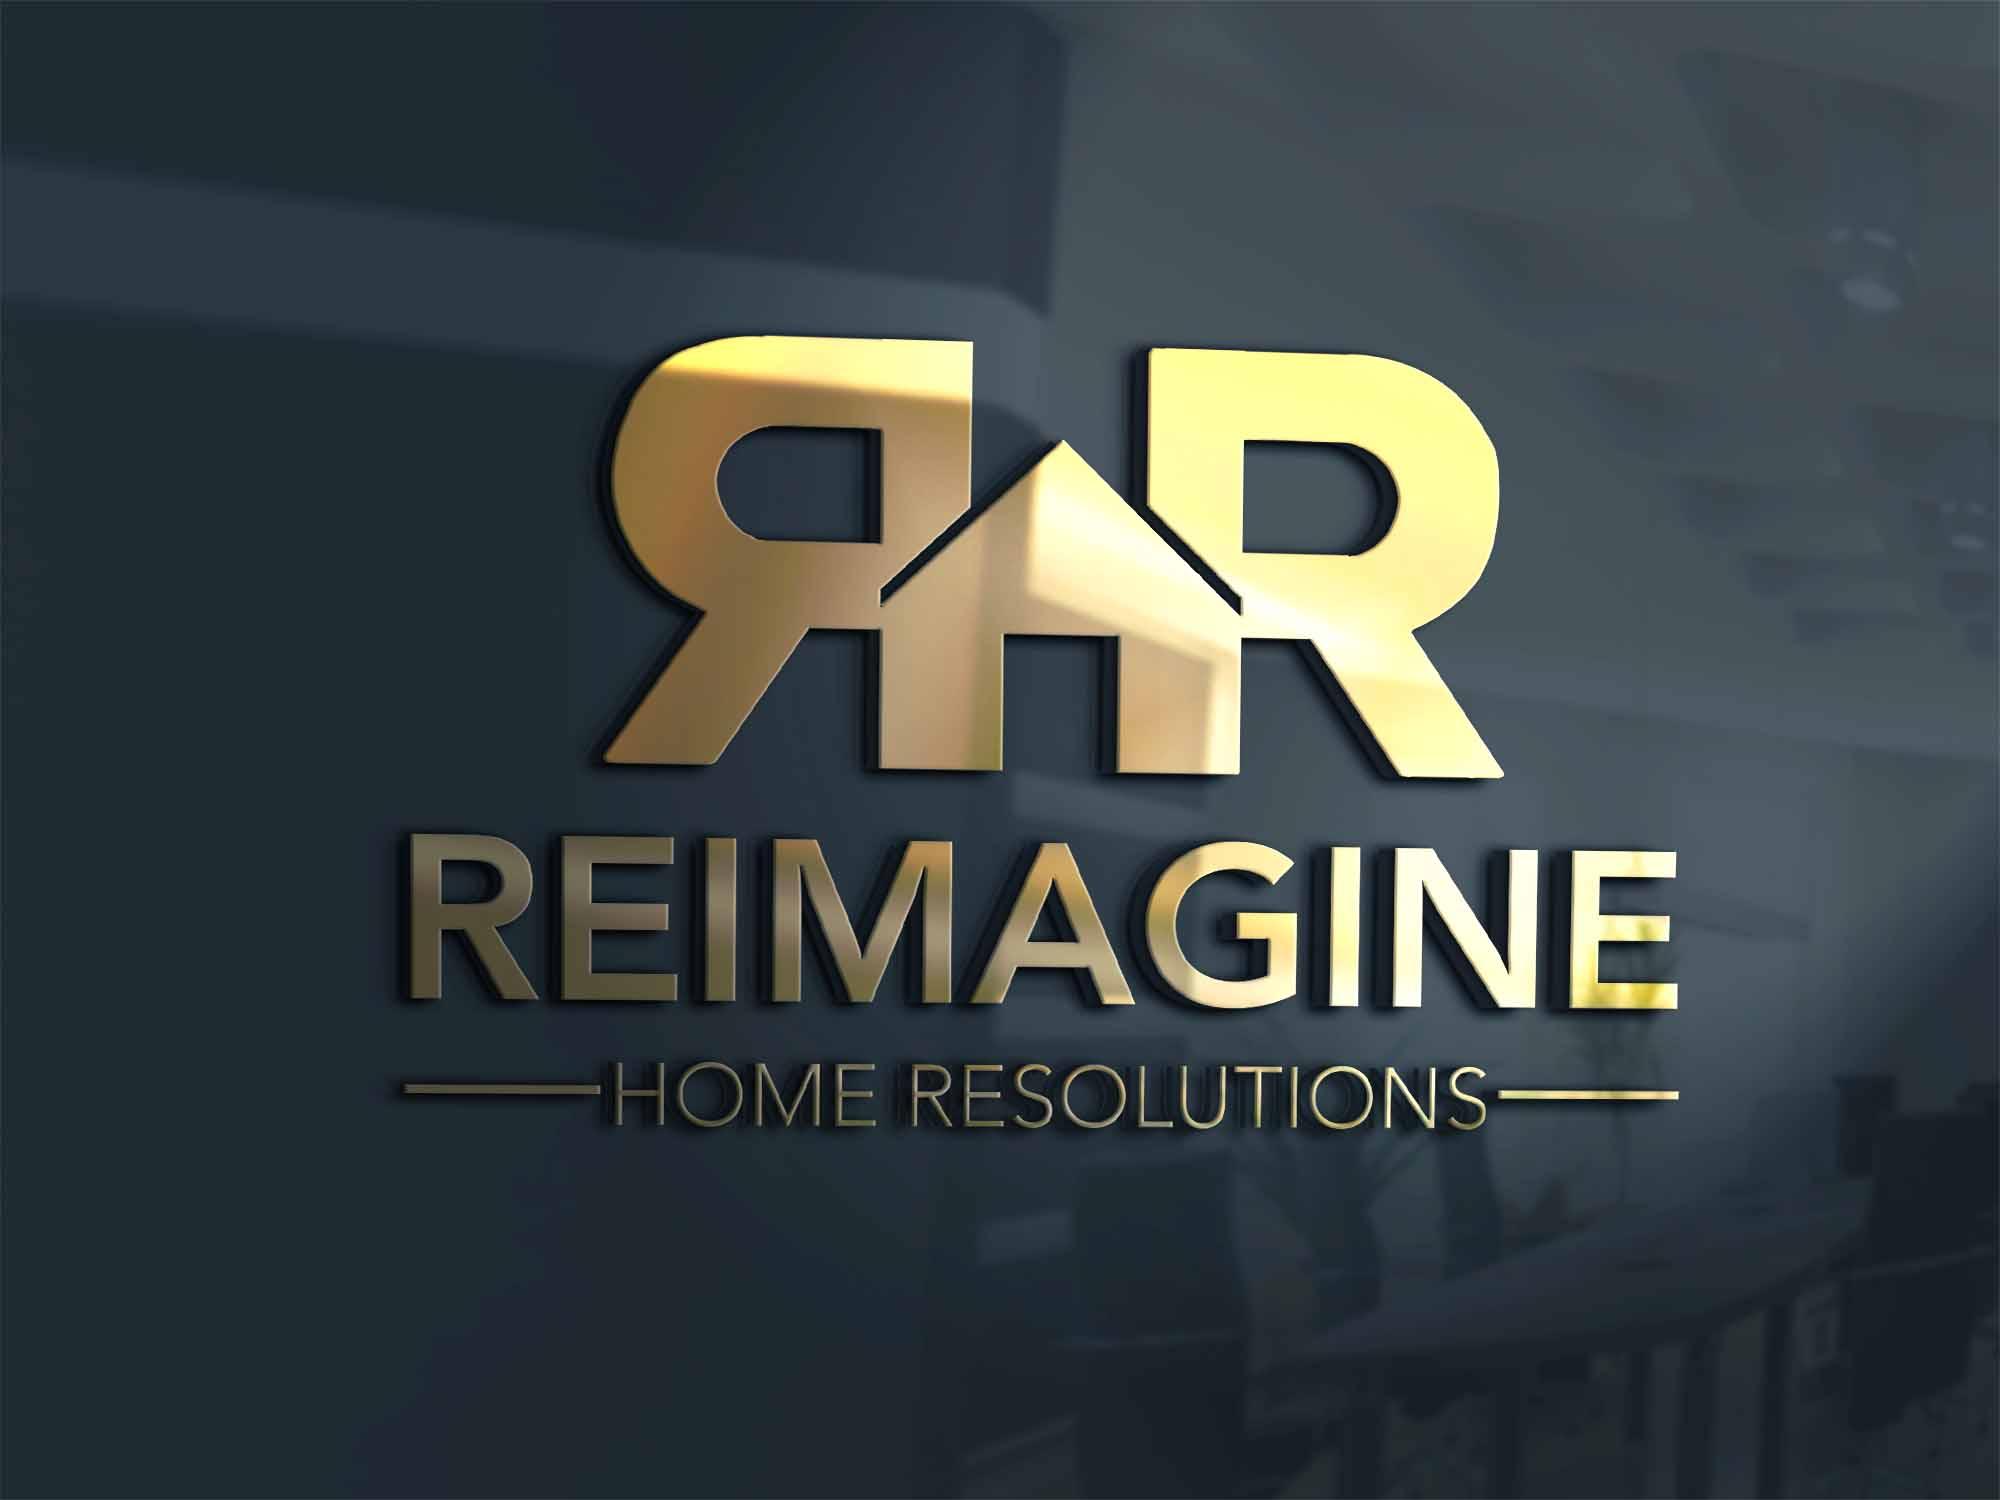 Reimagine Home Resolutions